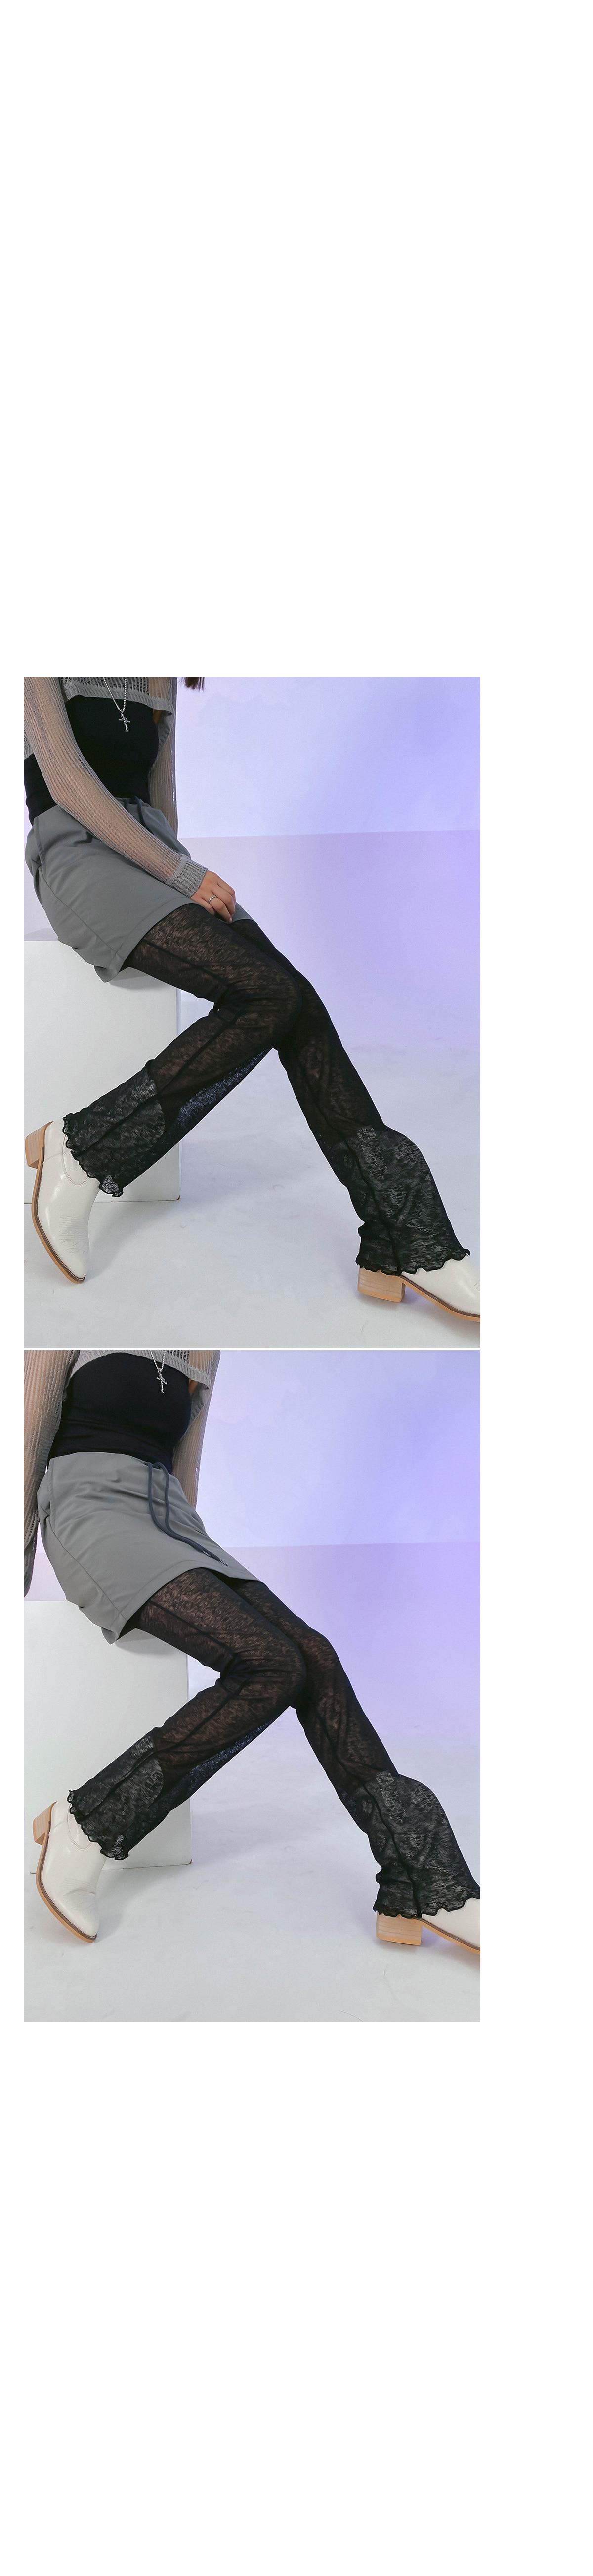 Layered see-through pants